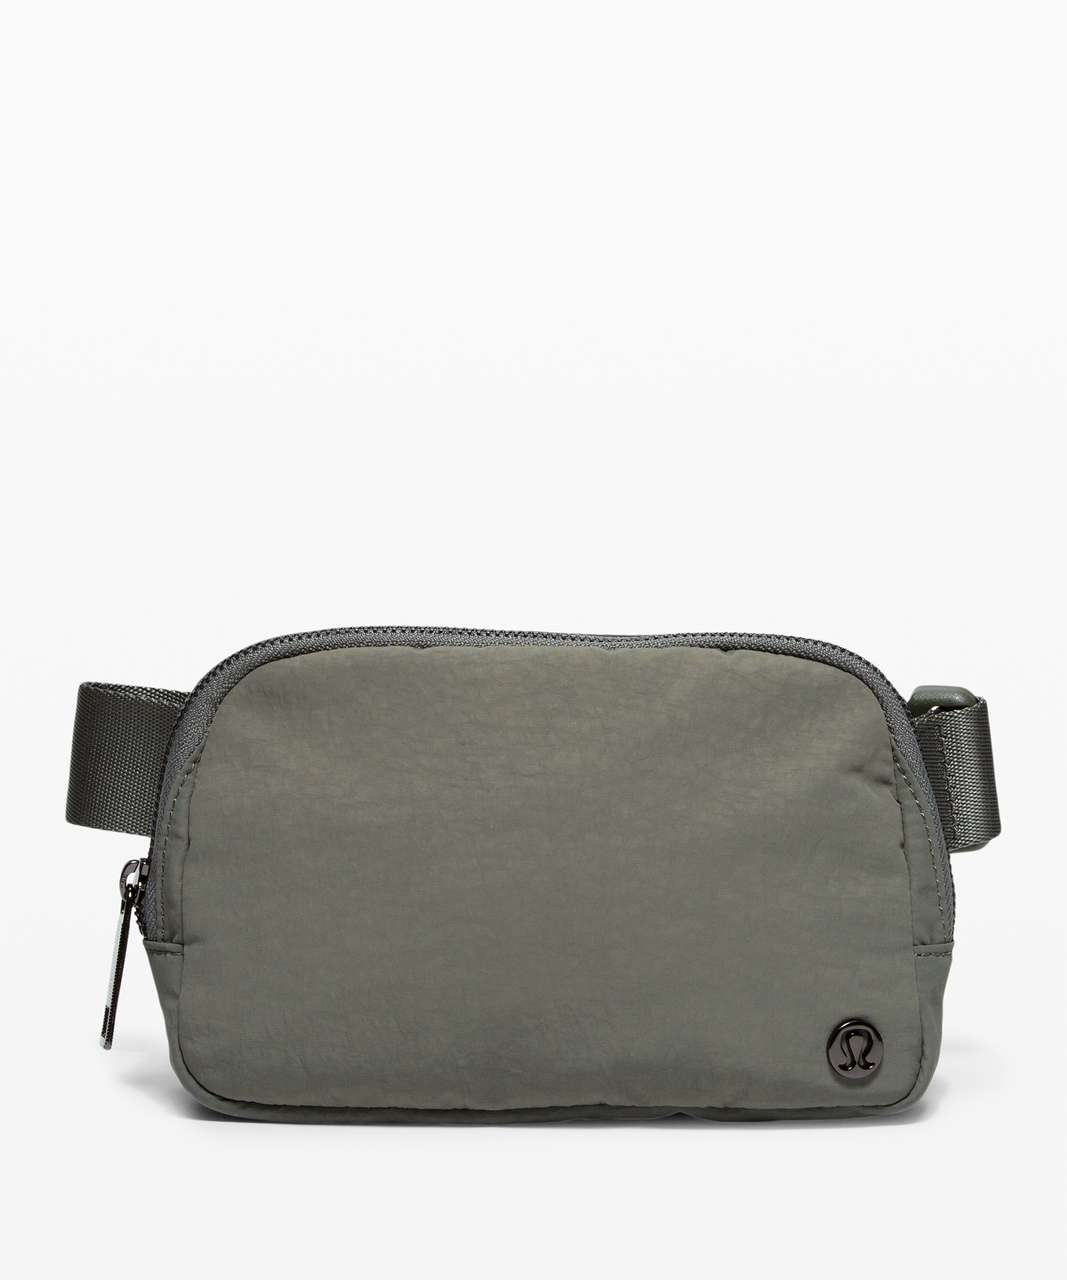 Lululemon Everywhere Belt Bag *1L - Grey Sage